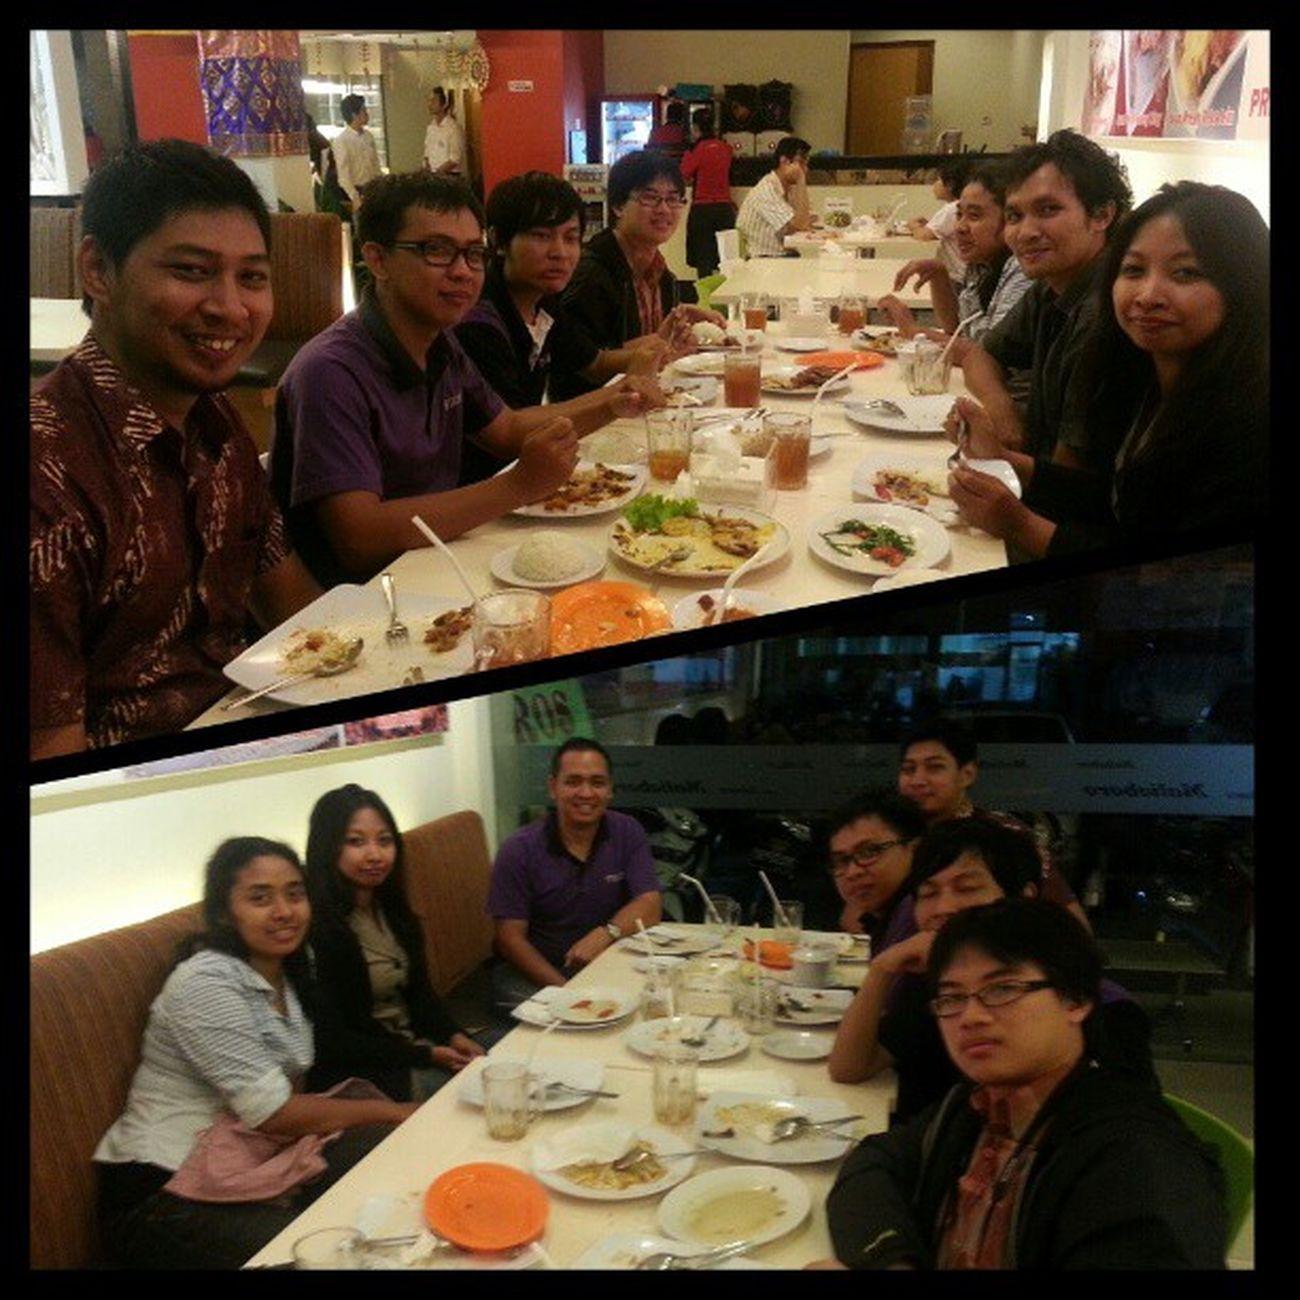 Team dinner. Mitrais